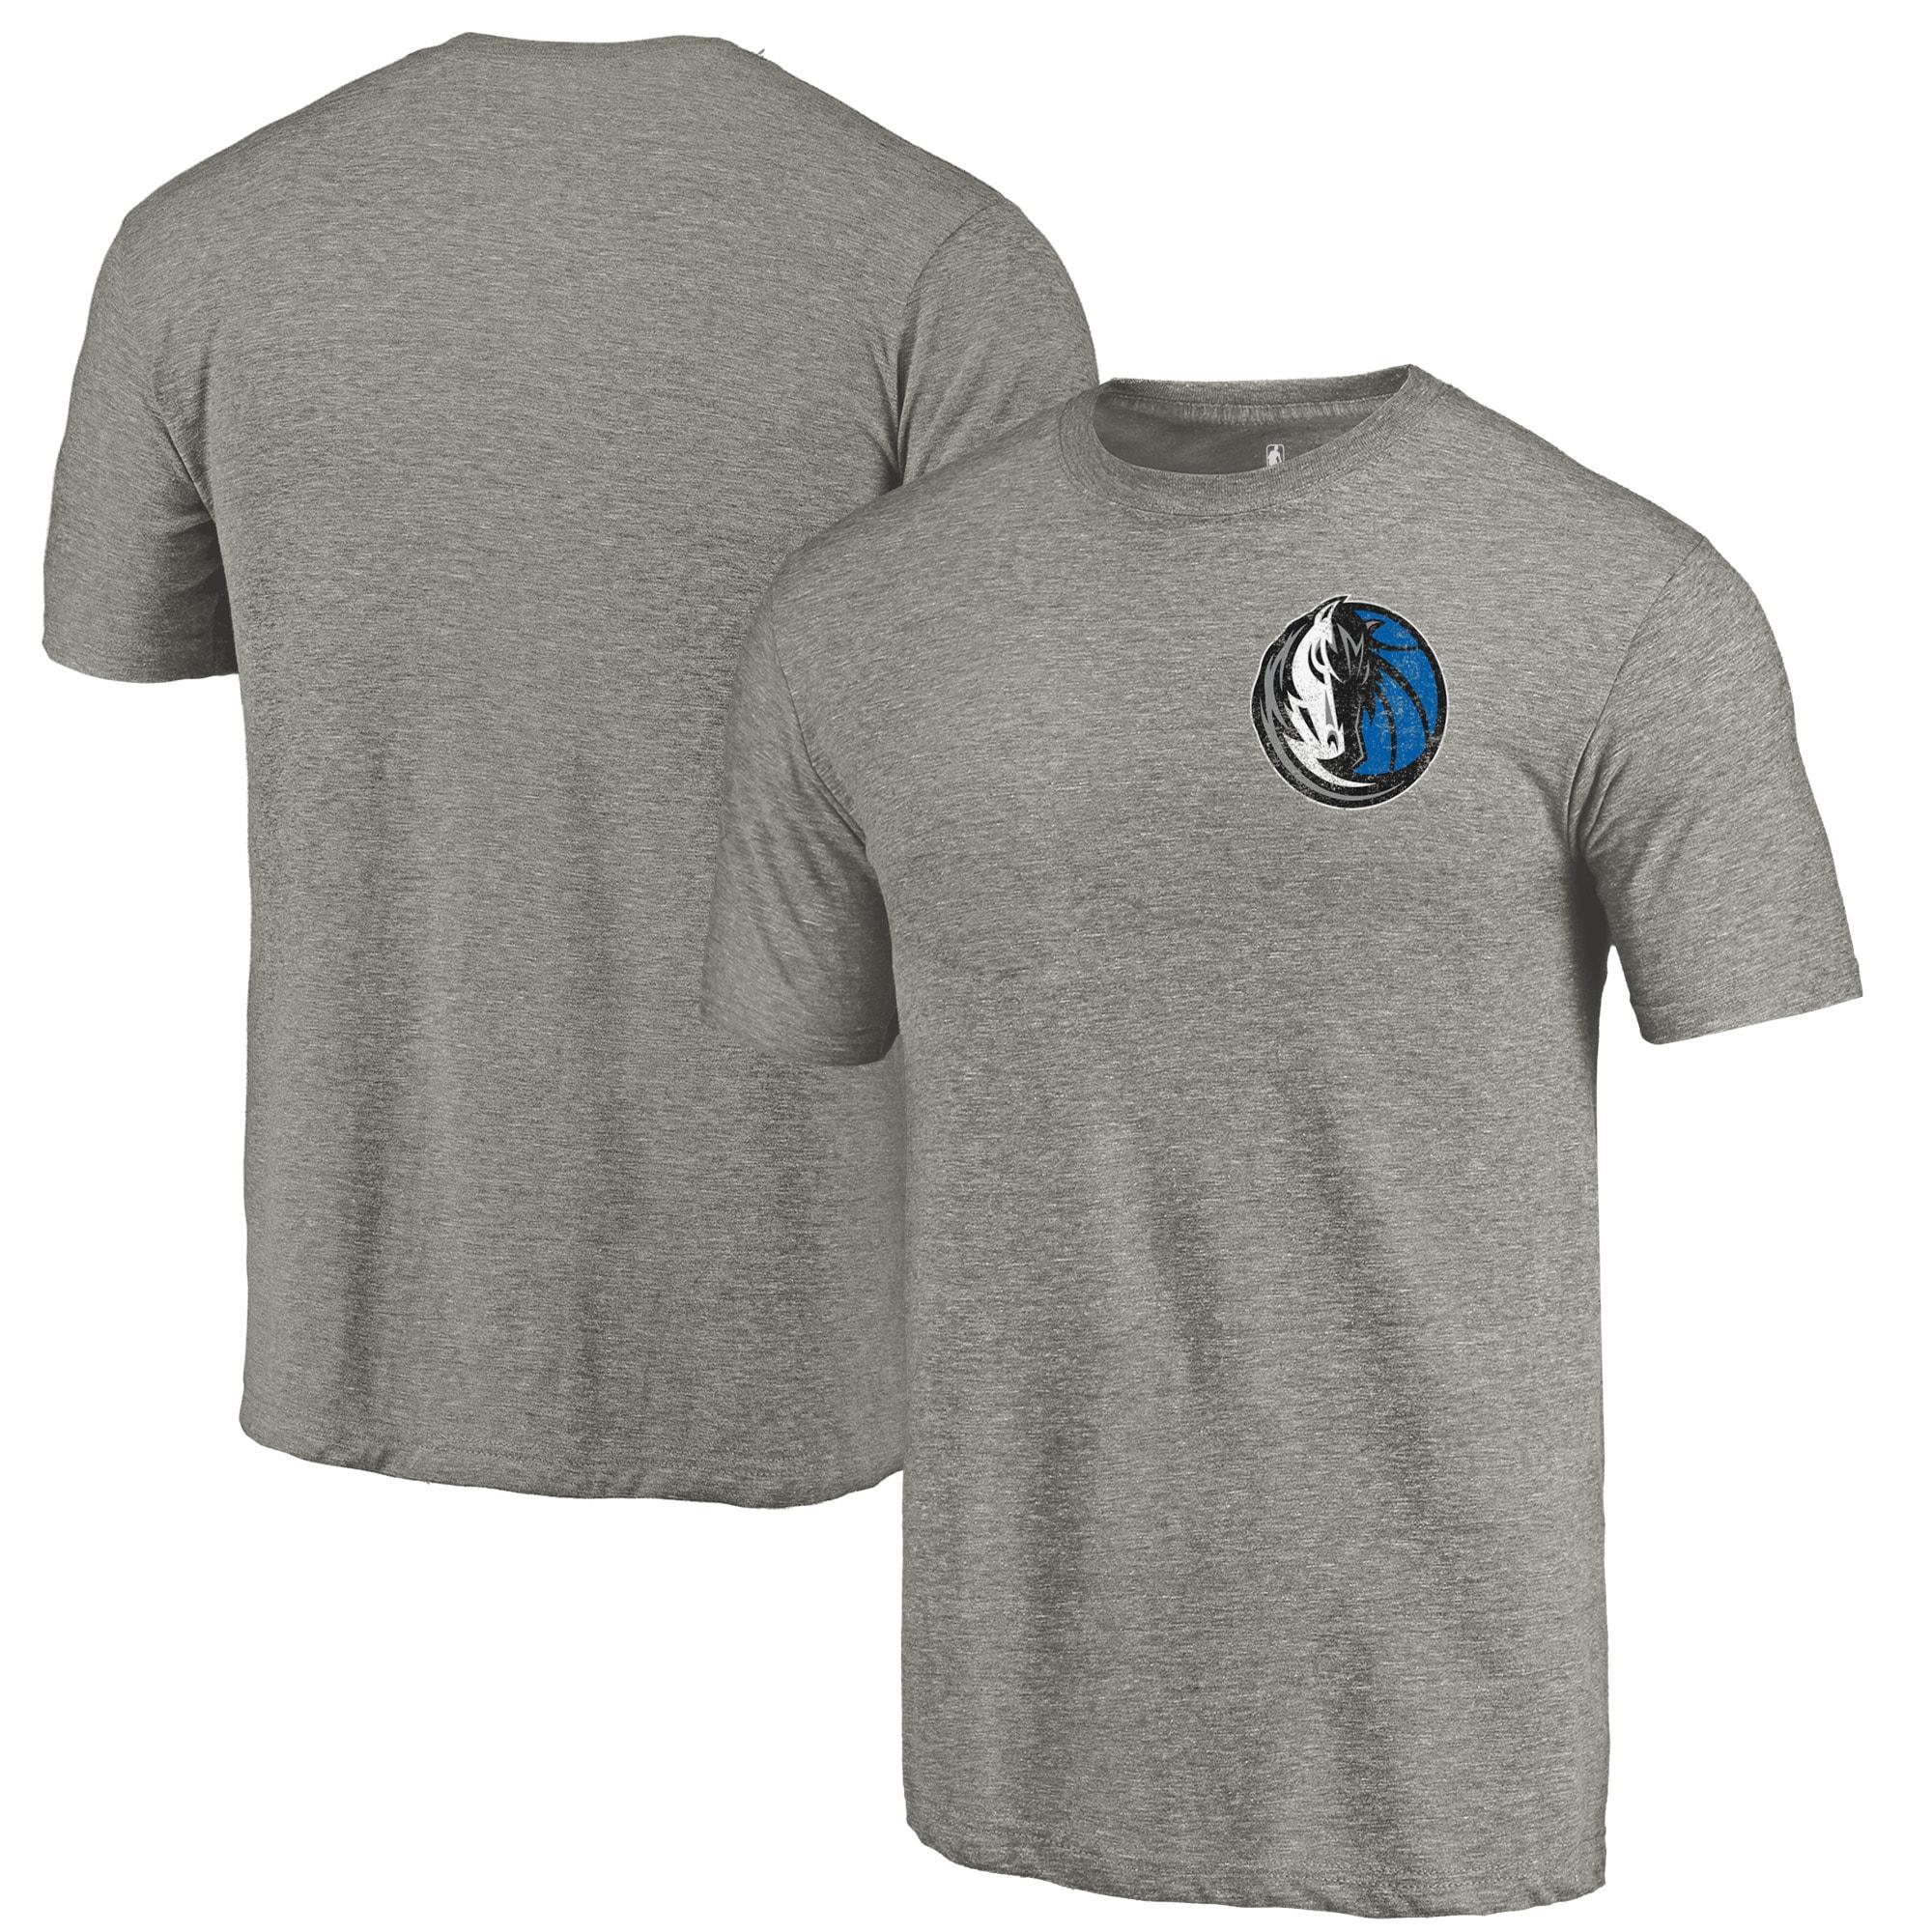 Dallas Mavericks Fanatics Branded Primary Logo Left Chest Distressed Tri-Blend T-Shirt - Gray